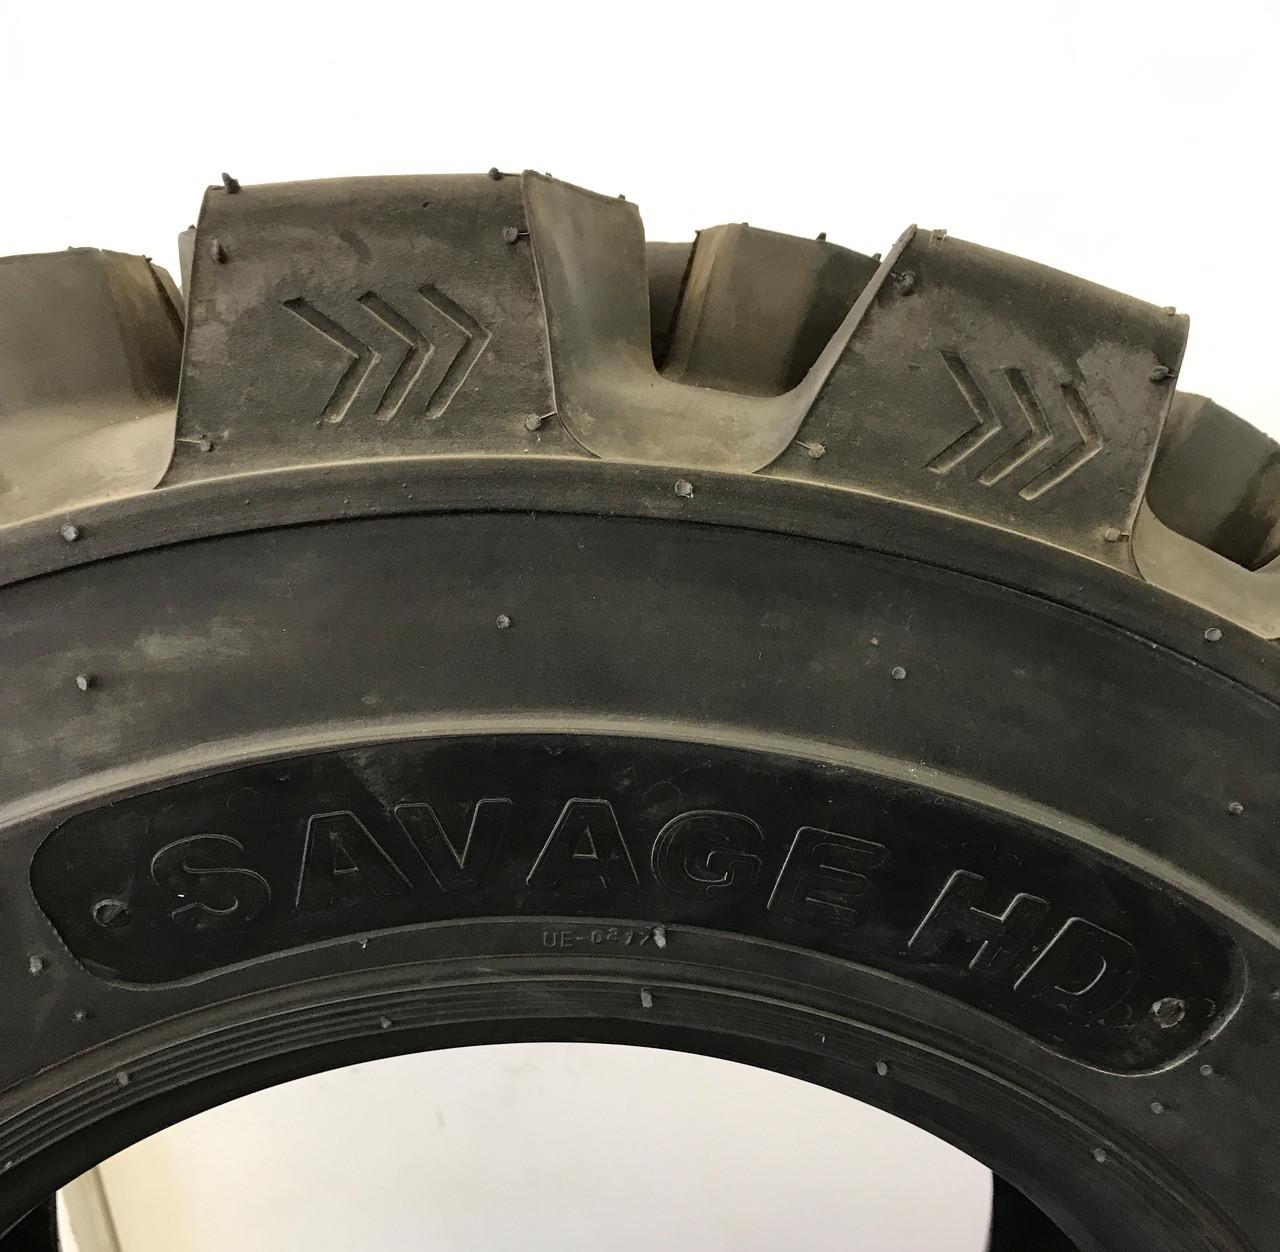 New Foam Filled Tire Mounted on Black Rim 12 16.5 Savage Premium Skid Steer 12 Ply DeepTread 50/32 12x16.5 PPT